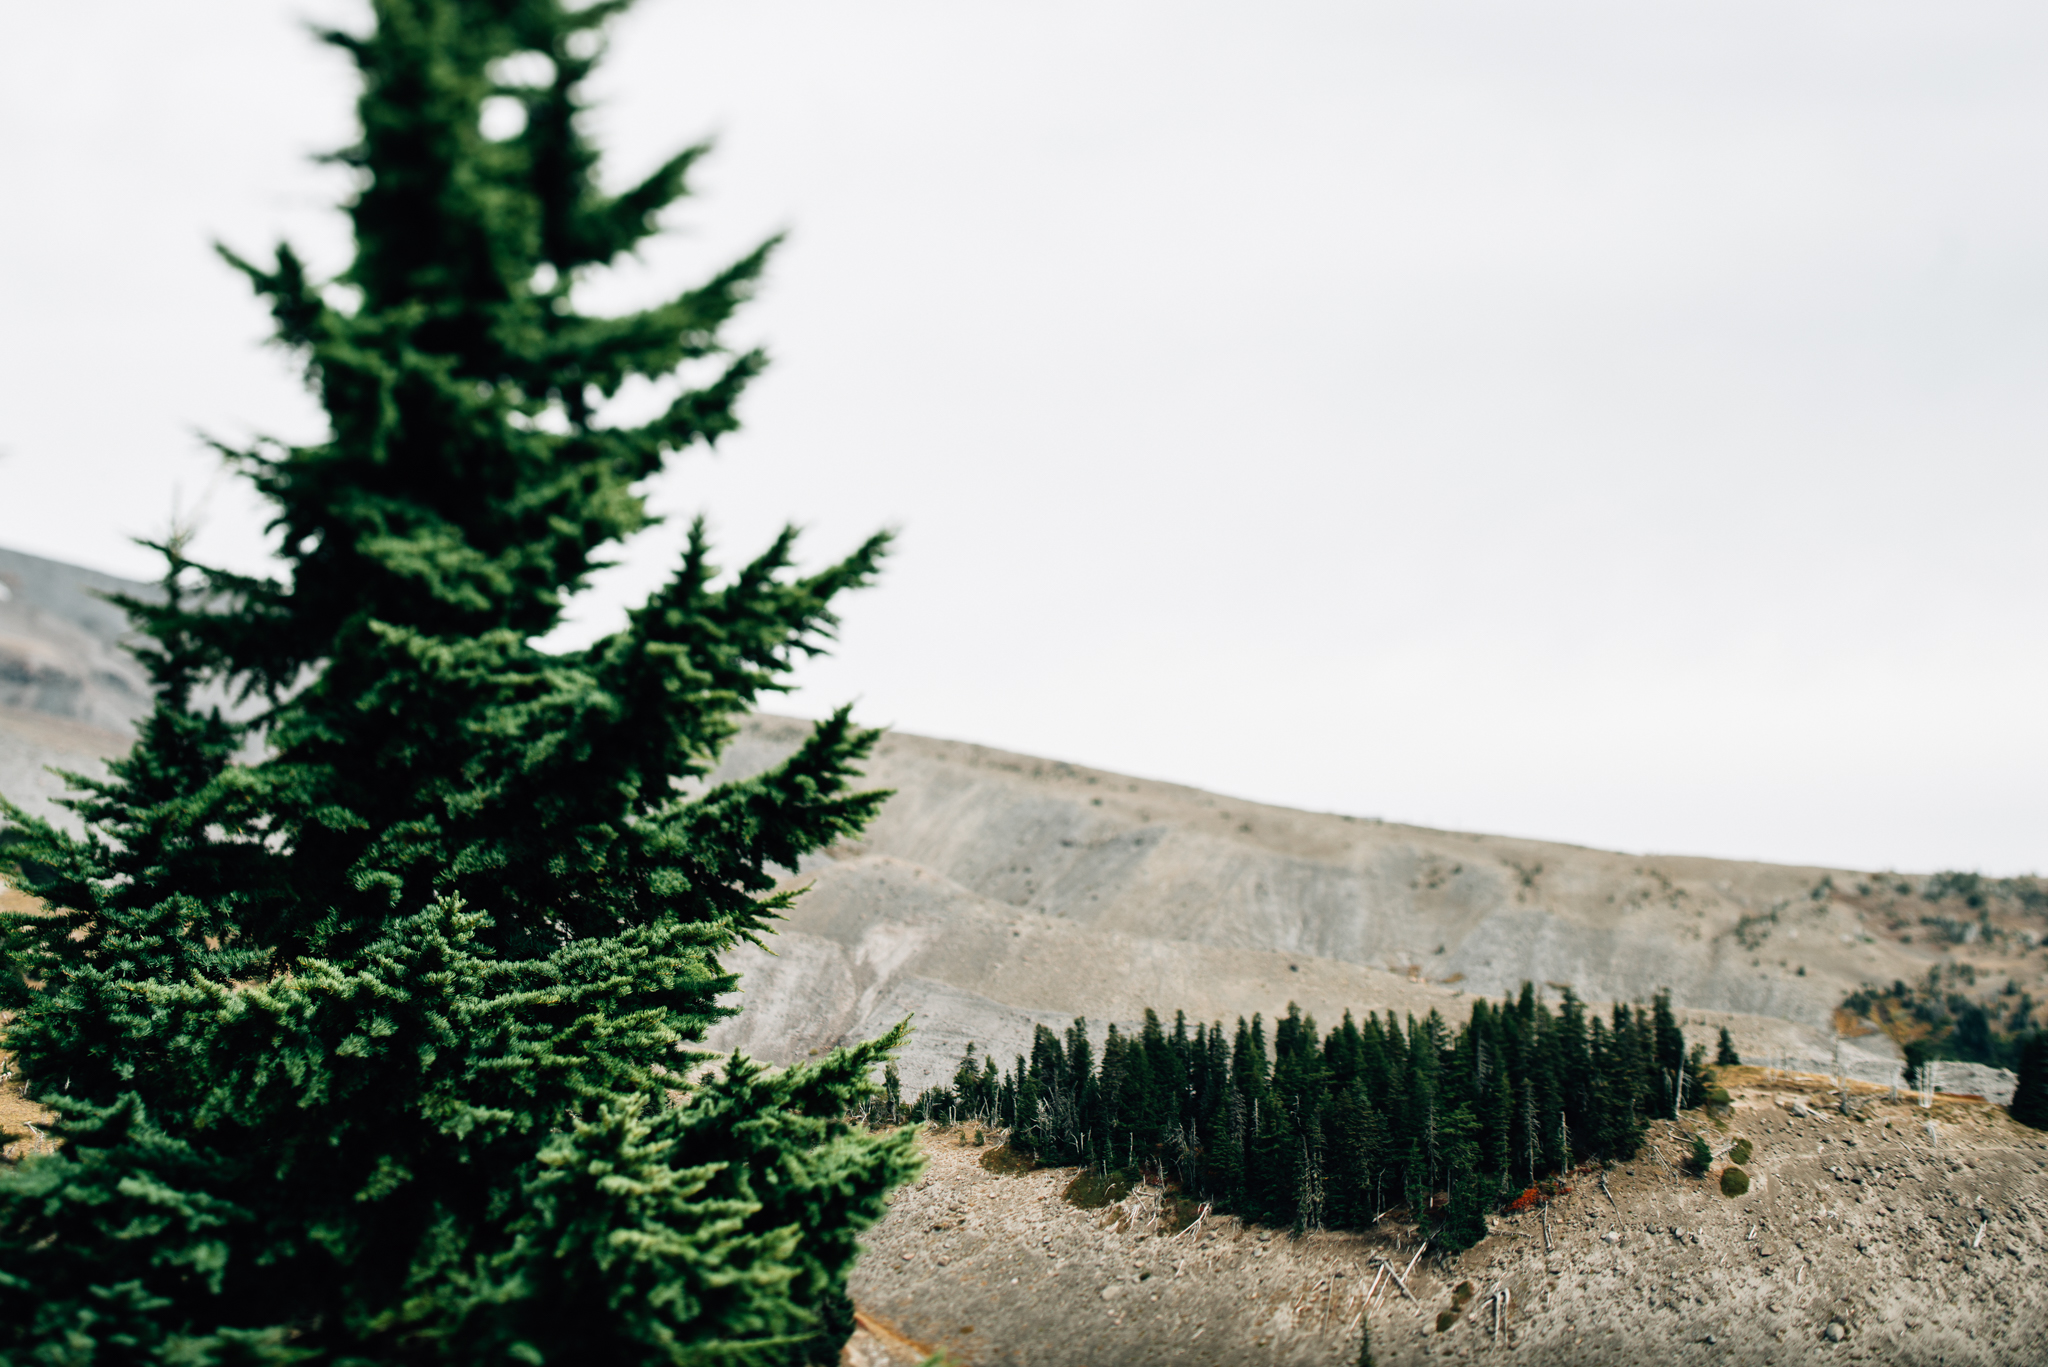 The Ryans Photography - Mt. Hood Oregon Adventure-010.jpg